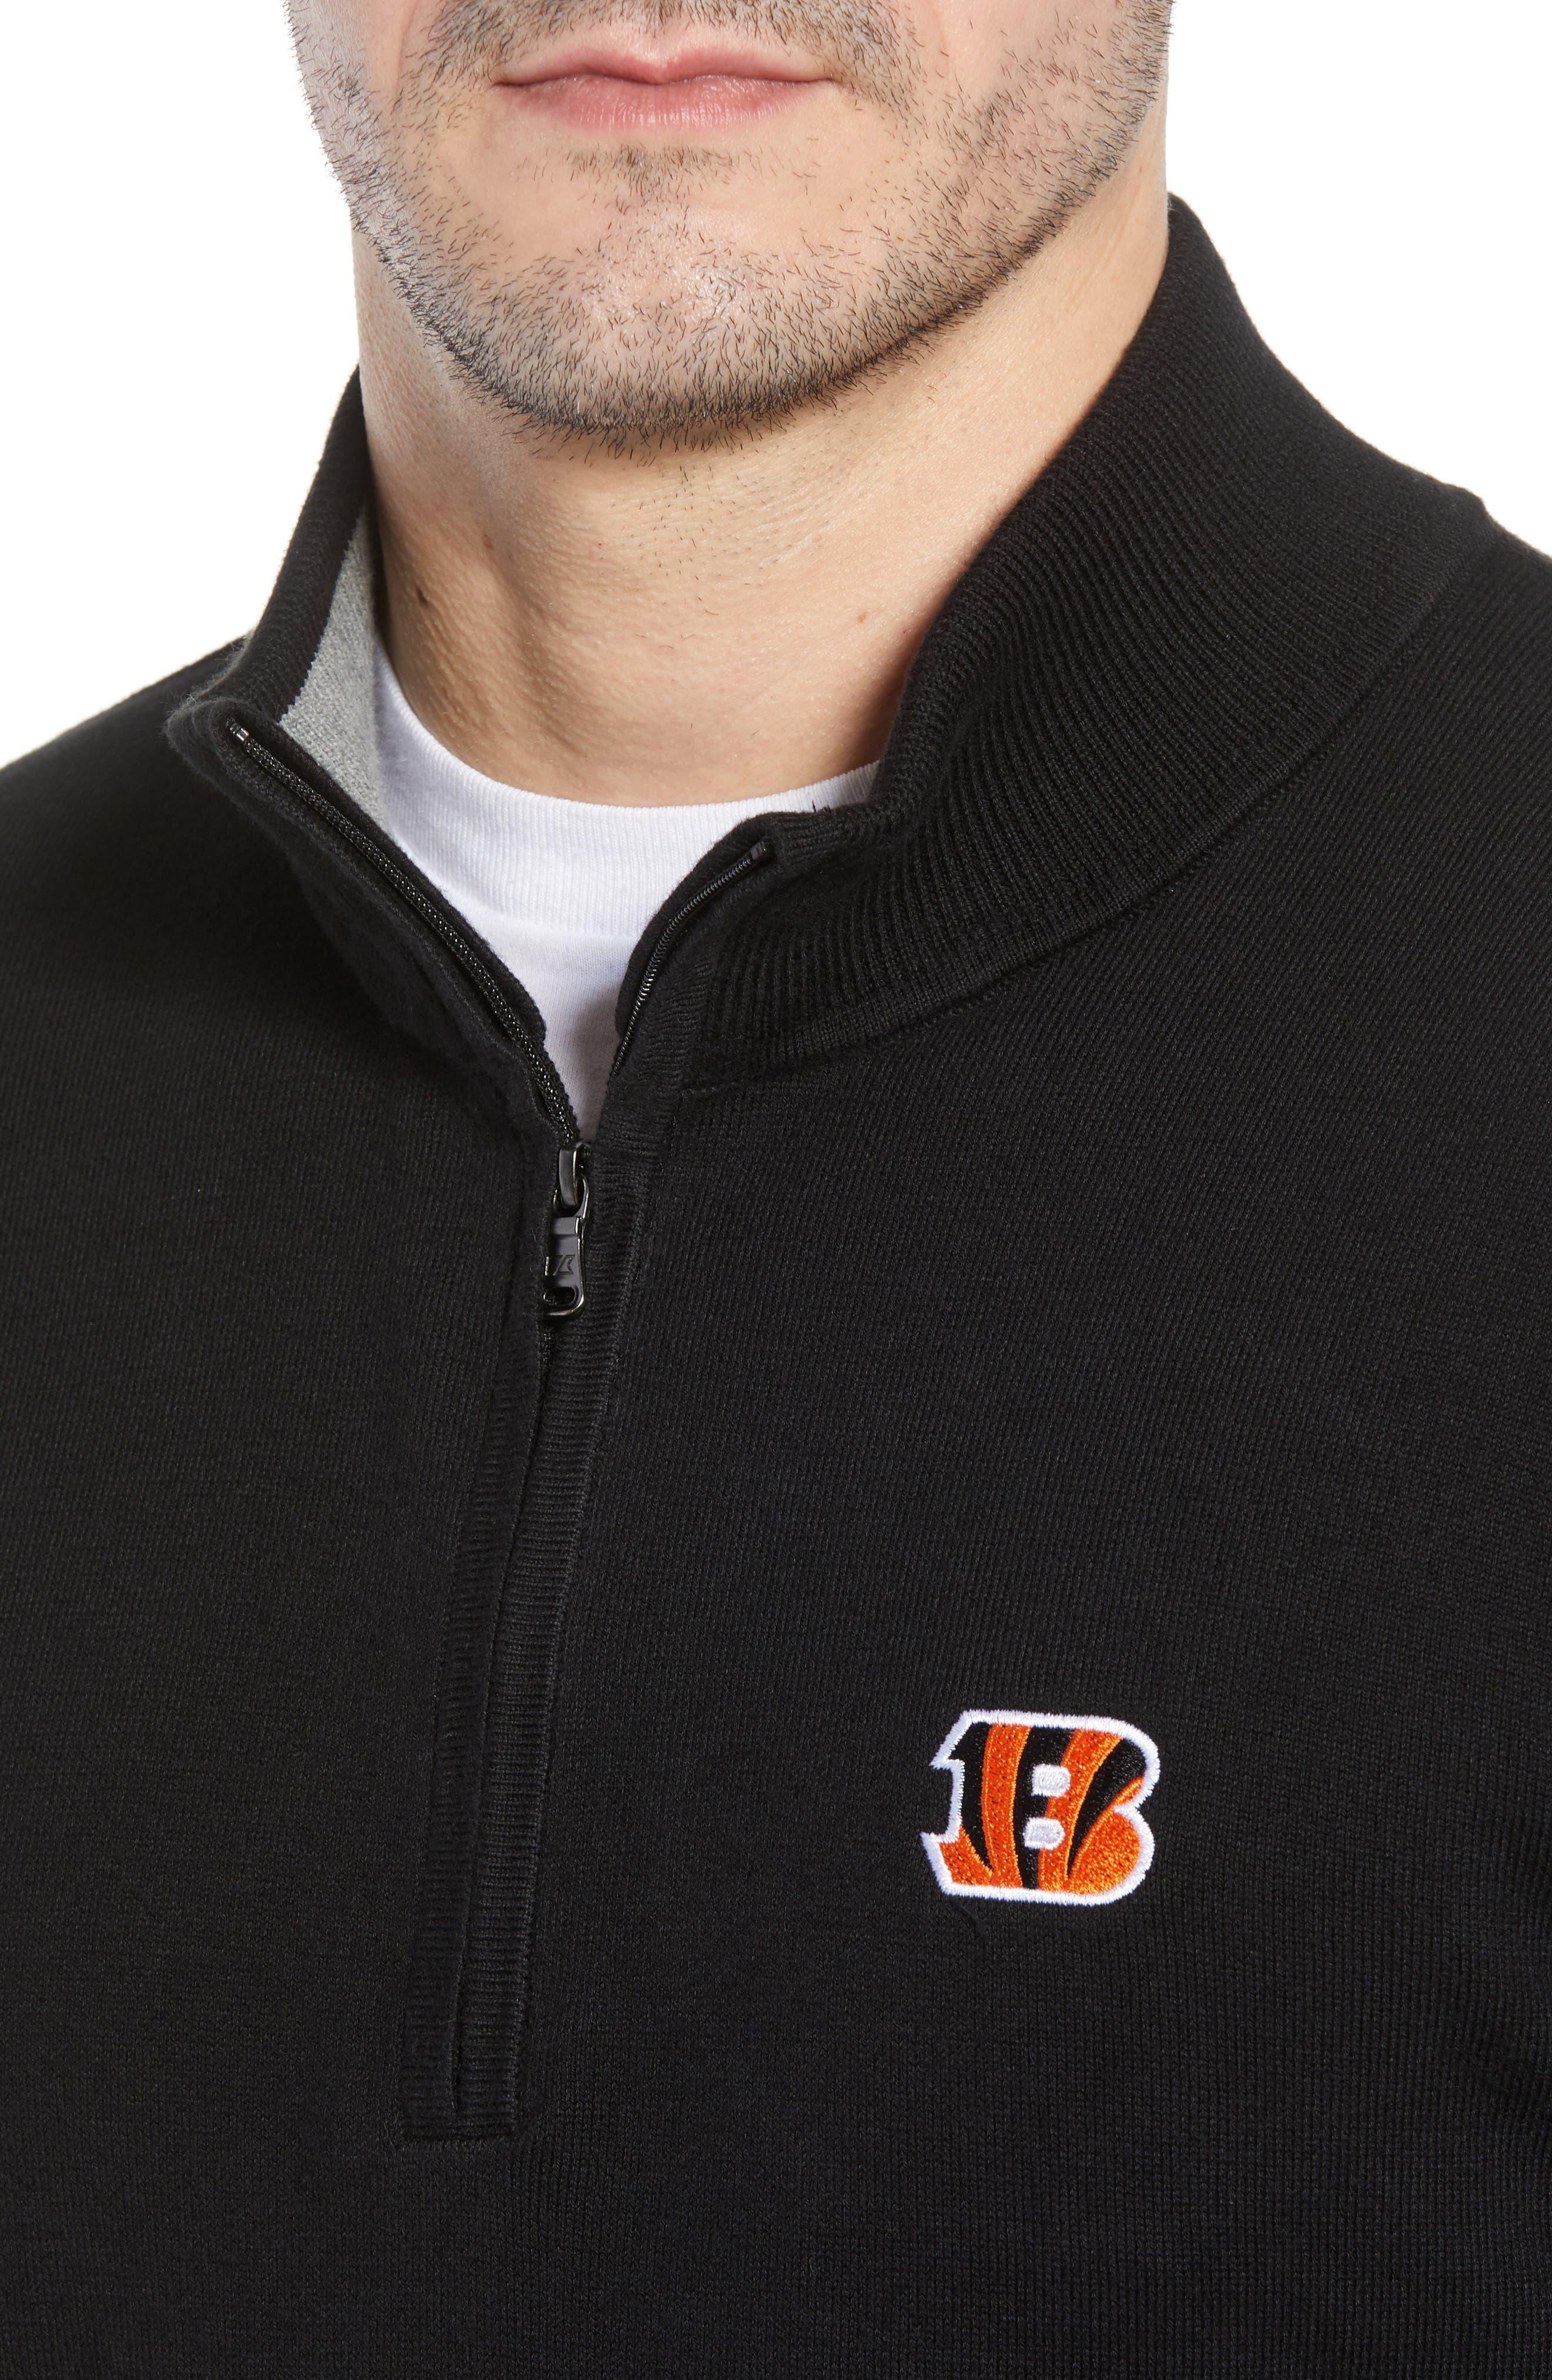 Cincinnati Bengals - Lakemont Regular Fit Quarter Zip Sweater,                             Alternate thumbnail 4, color,                             001